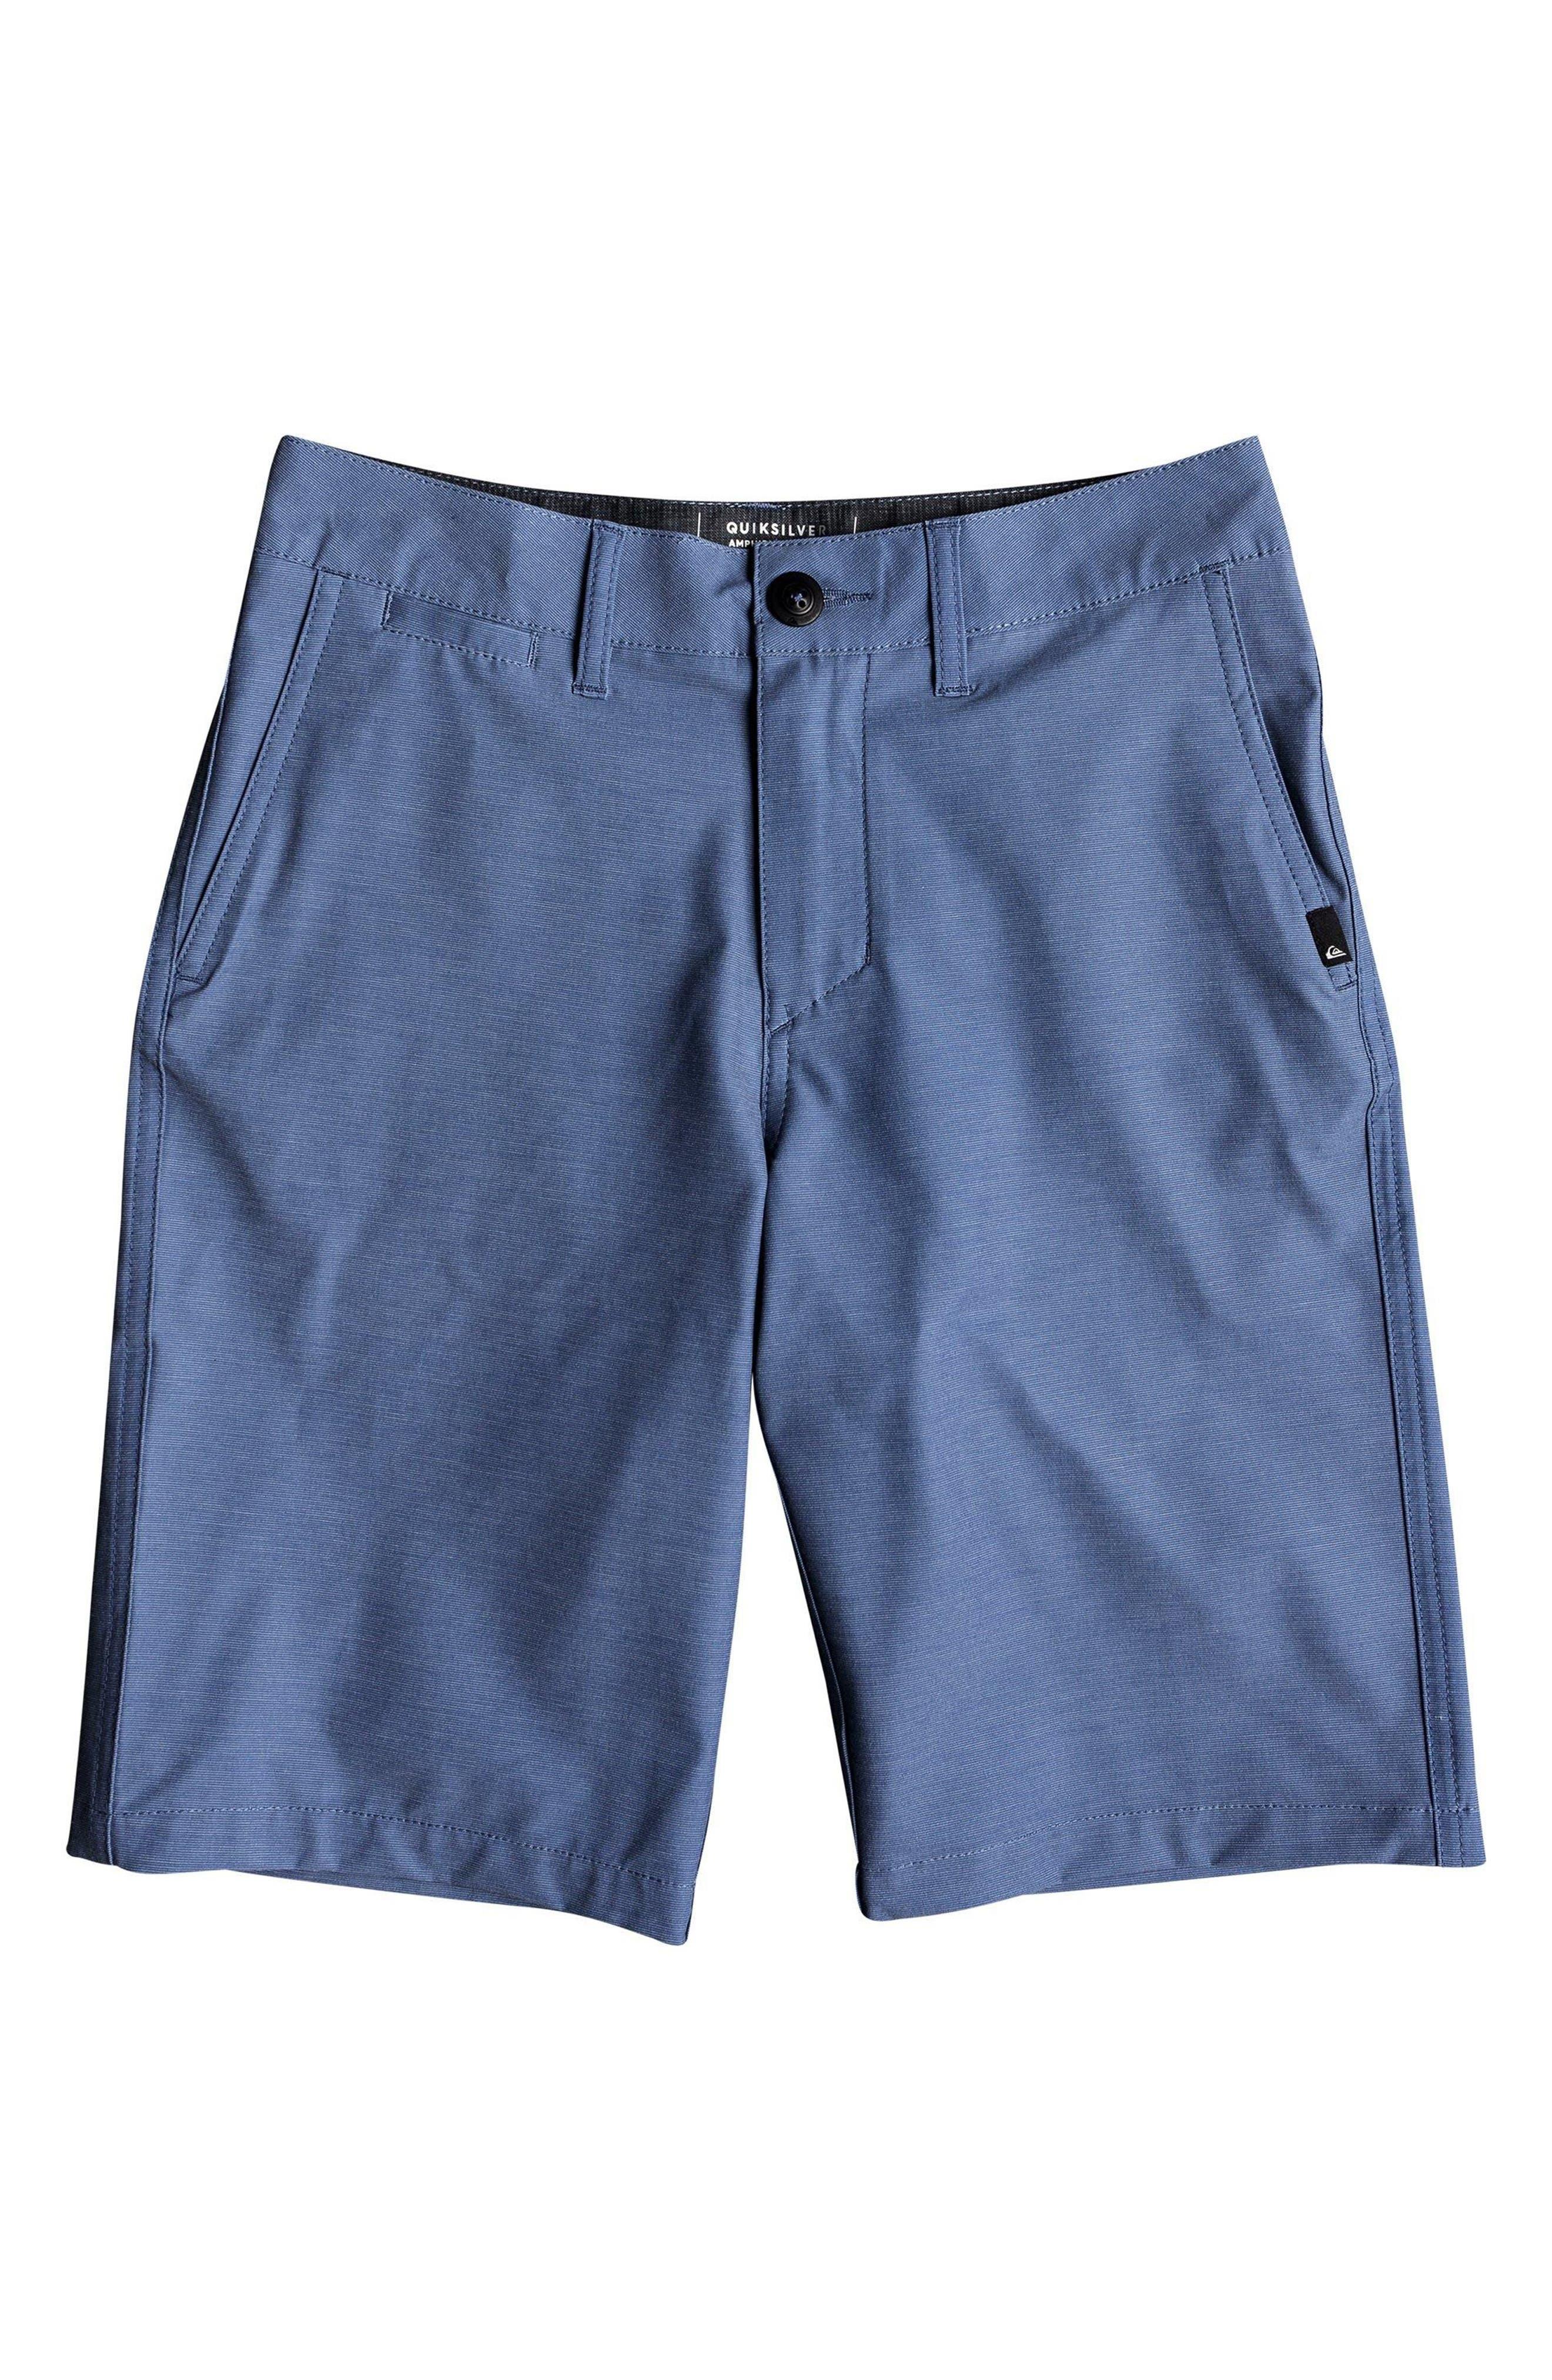 QUIKSILVER, Union Heather Amphibian Hybrid Shorts, Main thumbnail 1, color, BIJOU BLUE